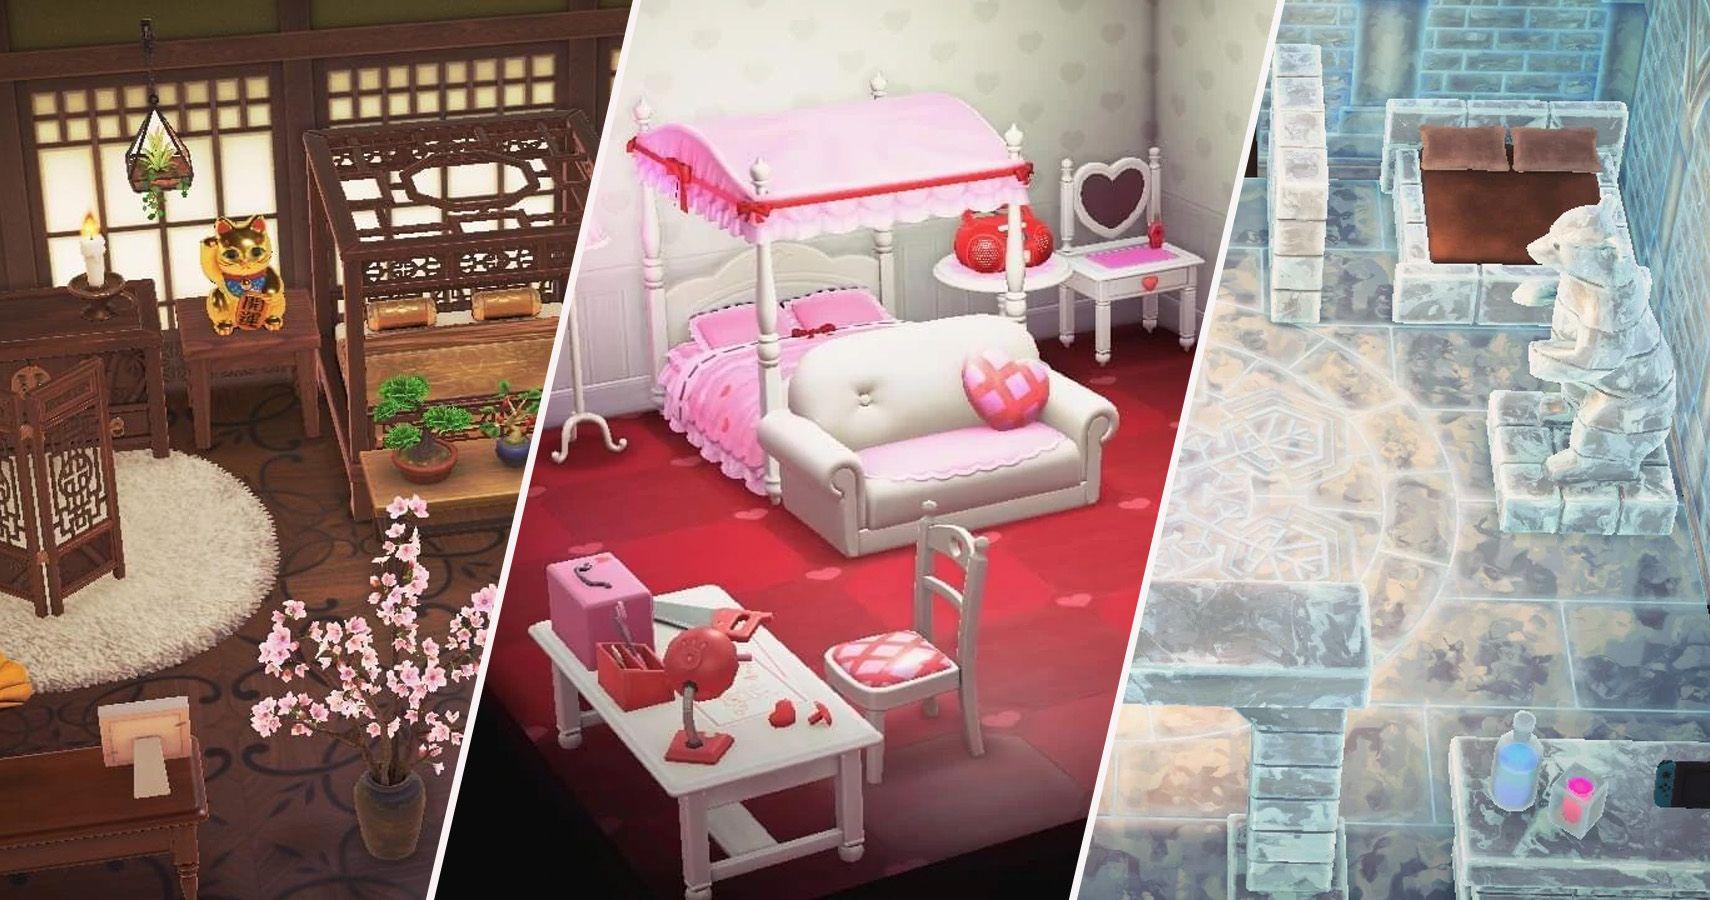 15 Best Furniture Series In Animal Crossing New Horizons Ranked